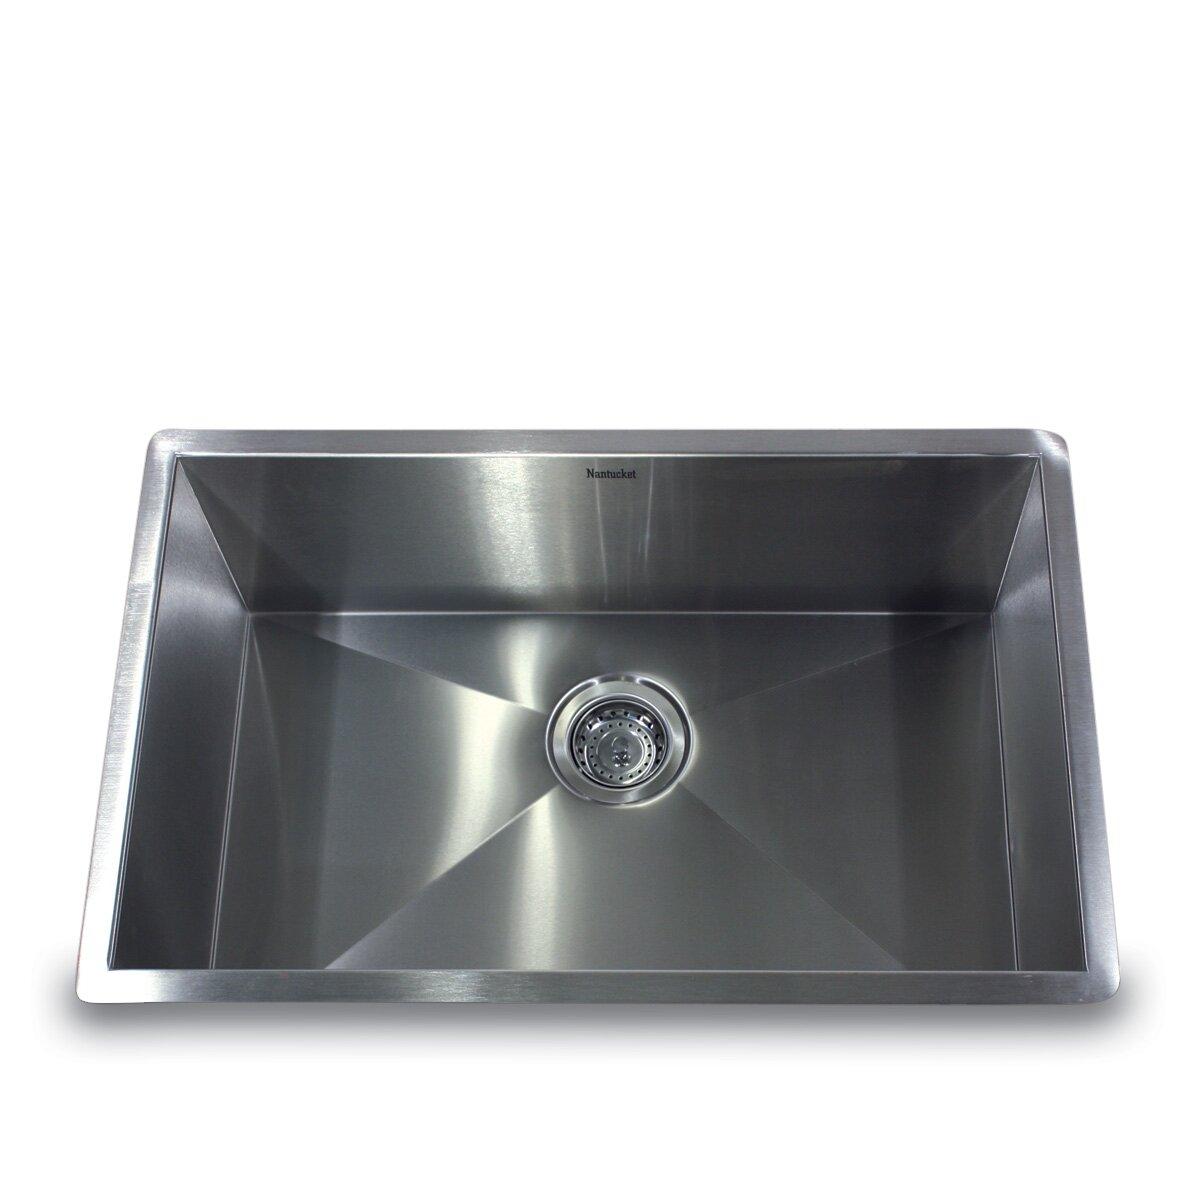 Nantucket Sinks 28 X 18 Zero Radius Large Single Bowl Undermount Kitchen Sink Reviews Wayfair